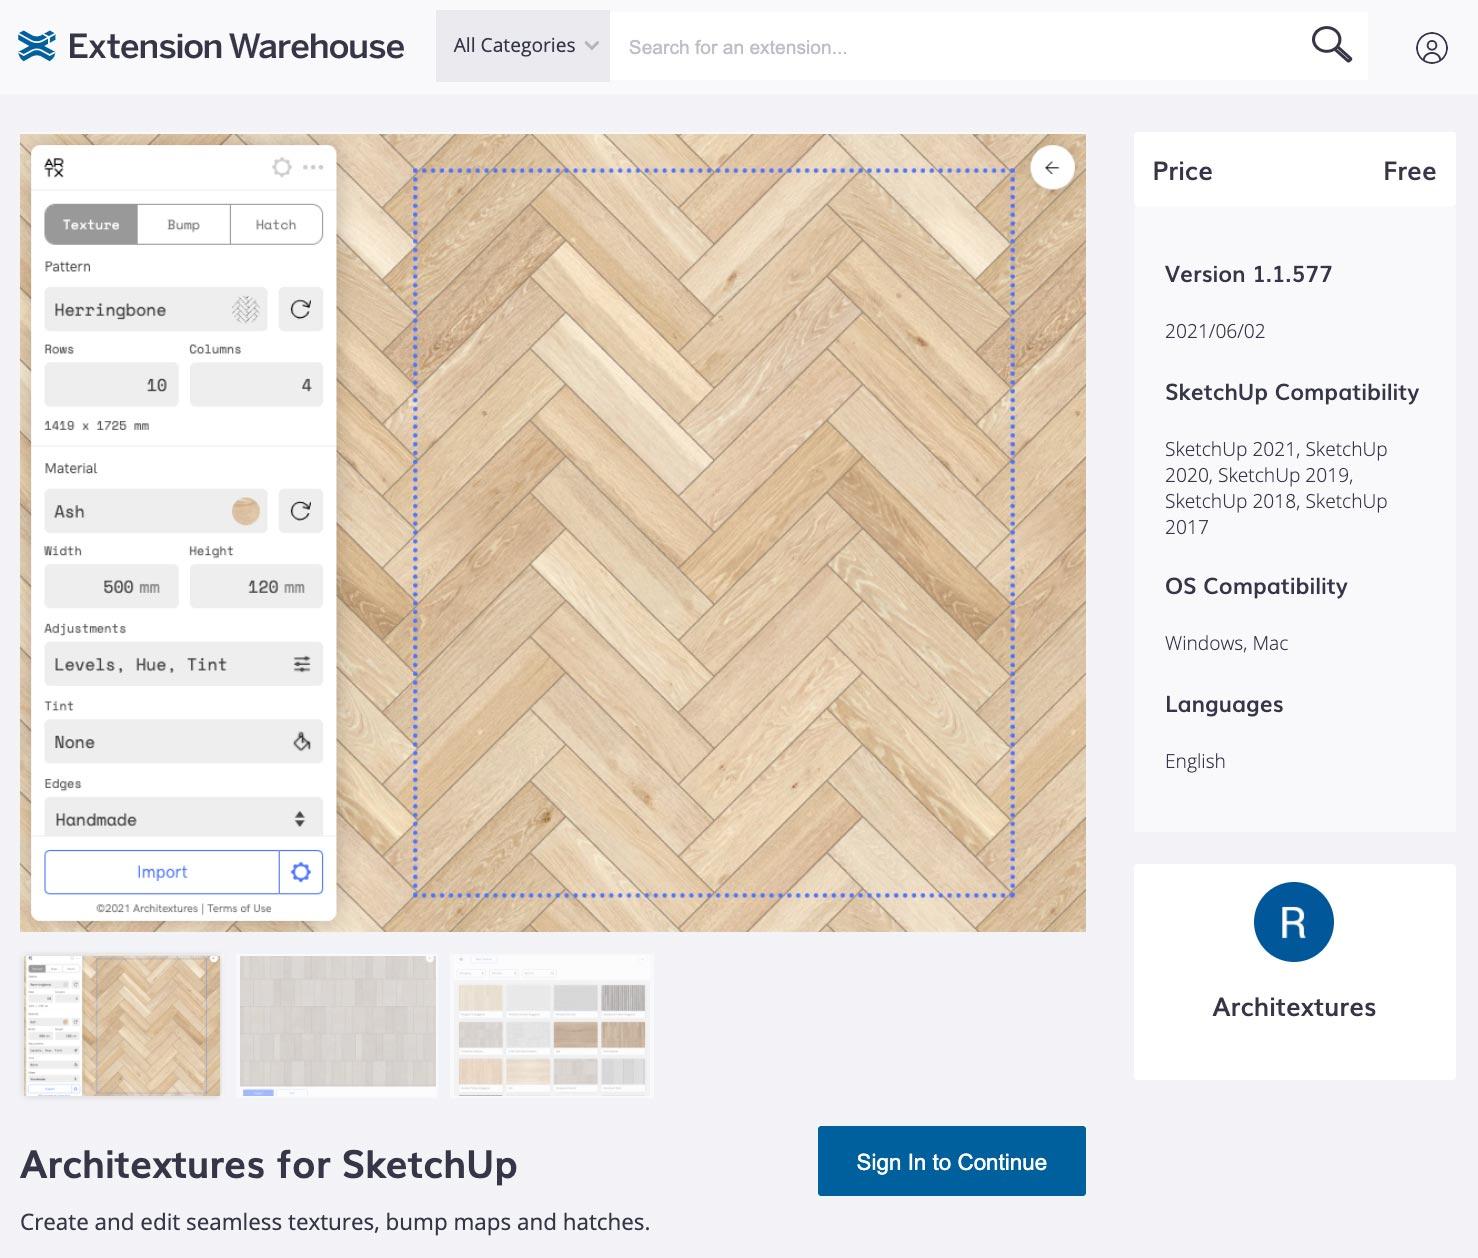 Screenshot of SketchUp Extension Warehouse interface